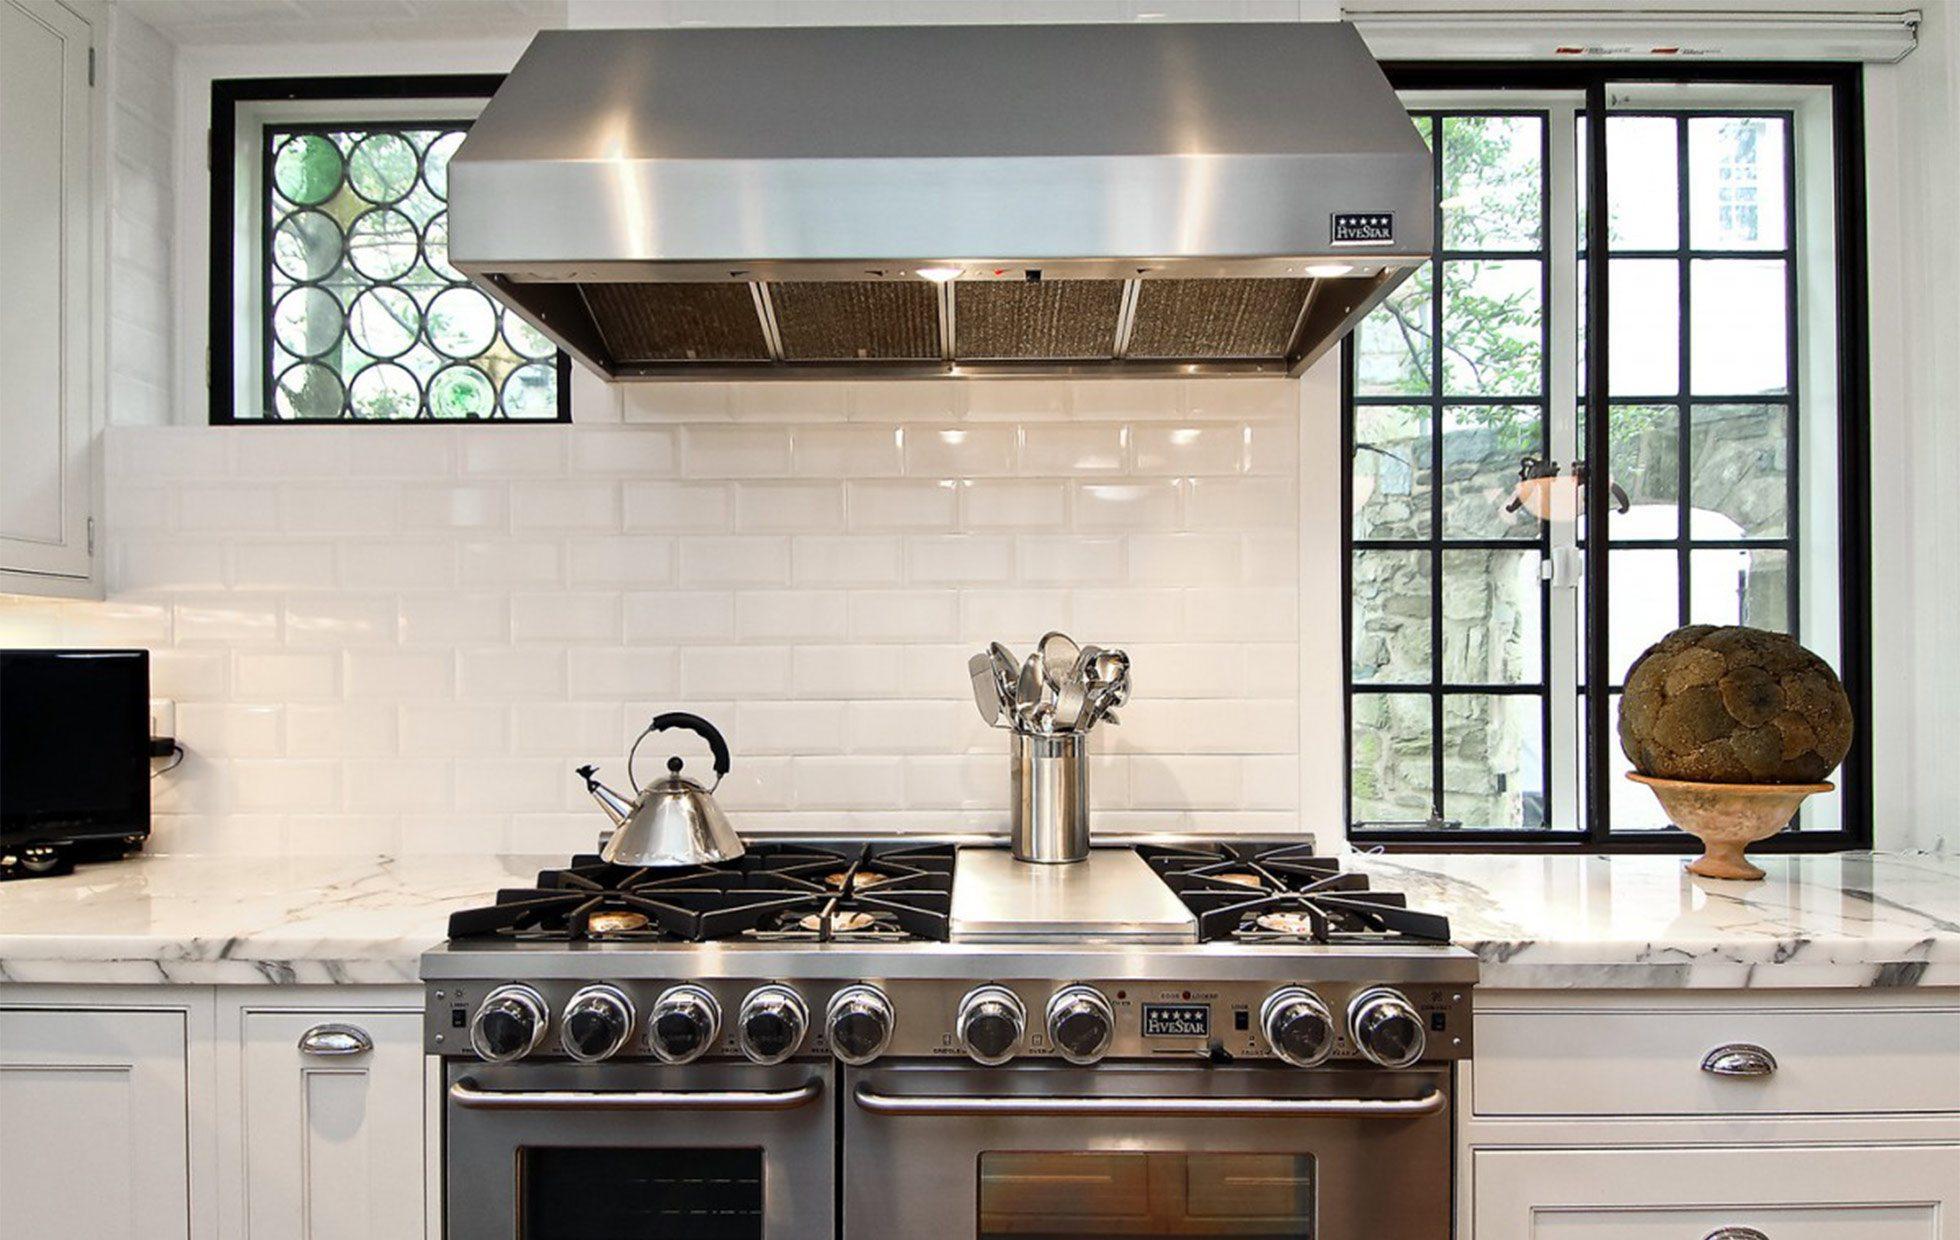 5882006fc051b2446-Belmont-Road-NW-Washington-DC-Obamas-New-Home-Kitchen-1200x800